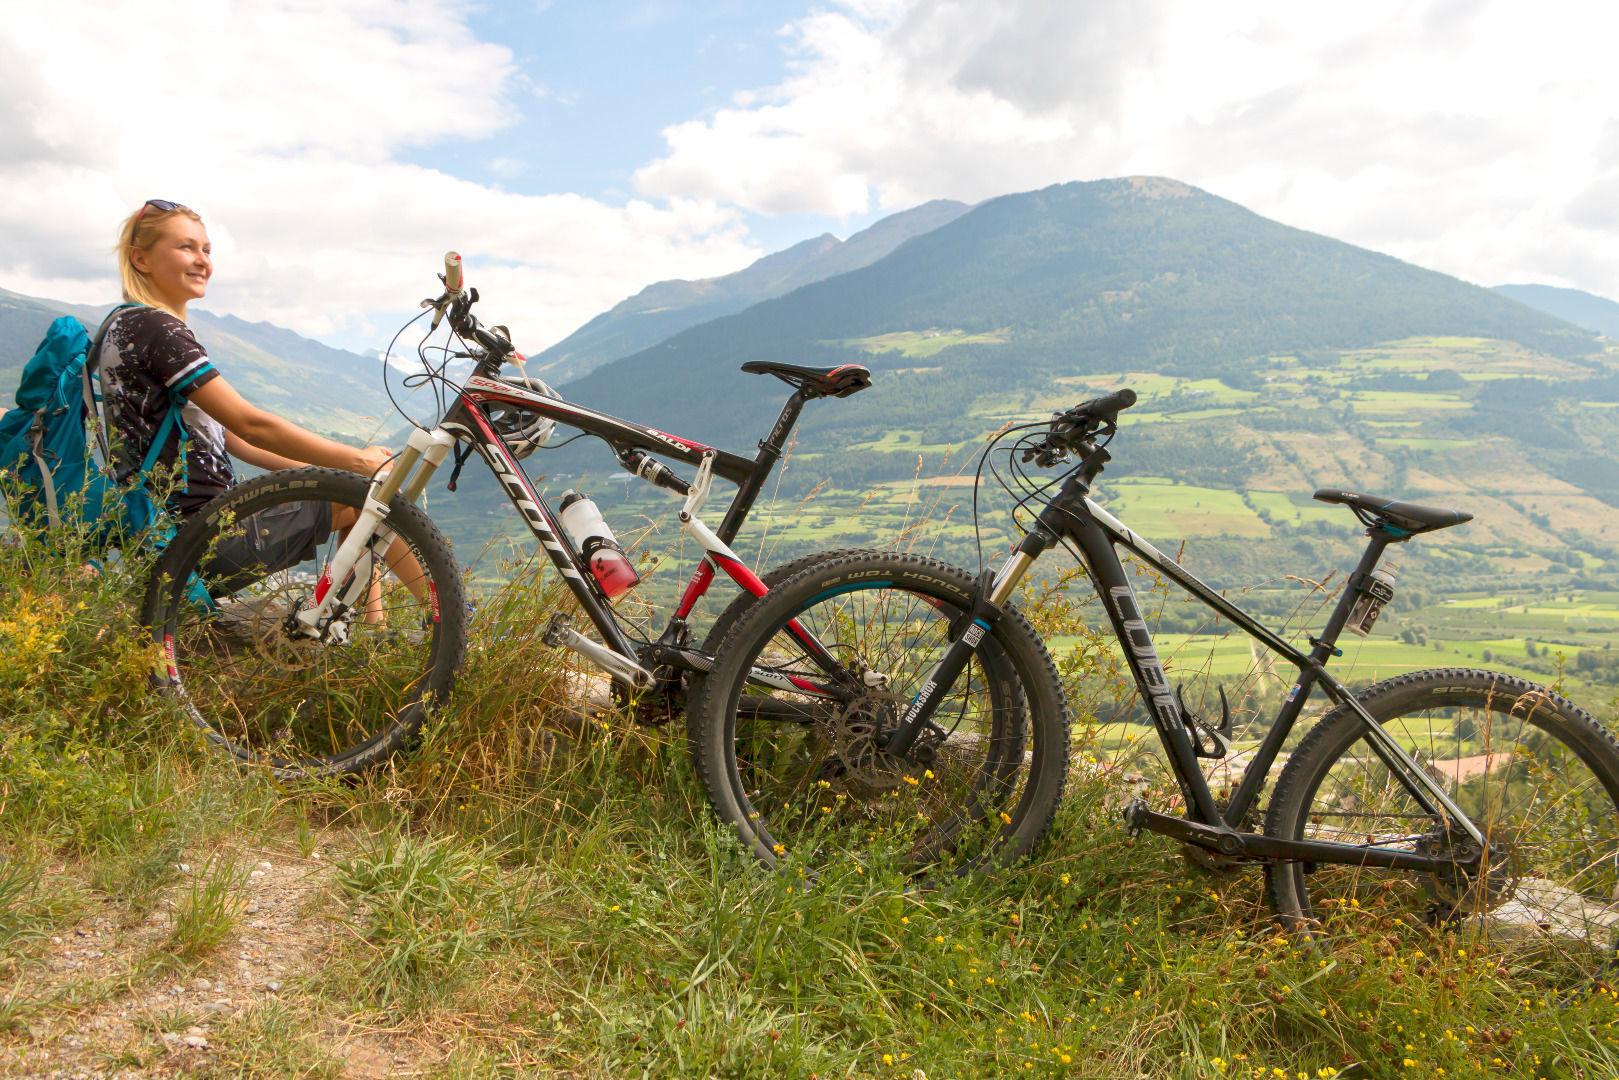 mountainbiken-gungadria-tour-vinschgau-fb